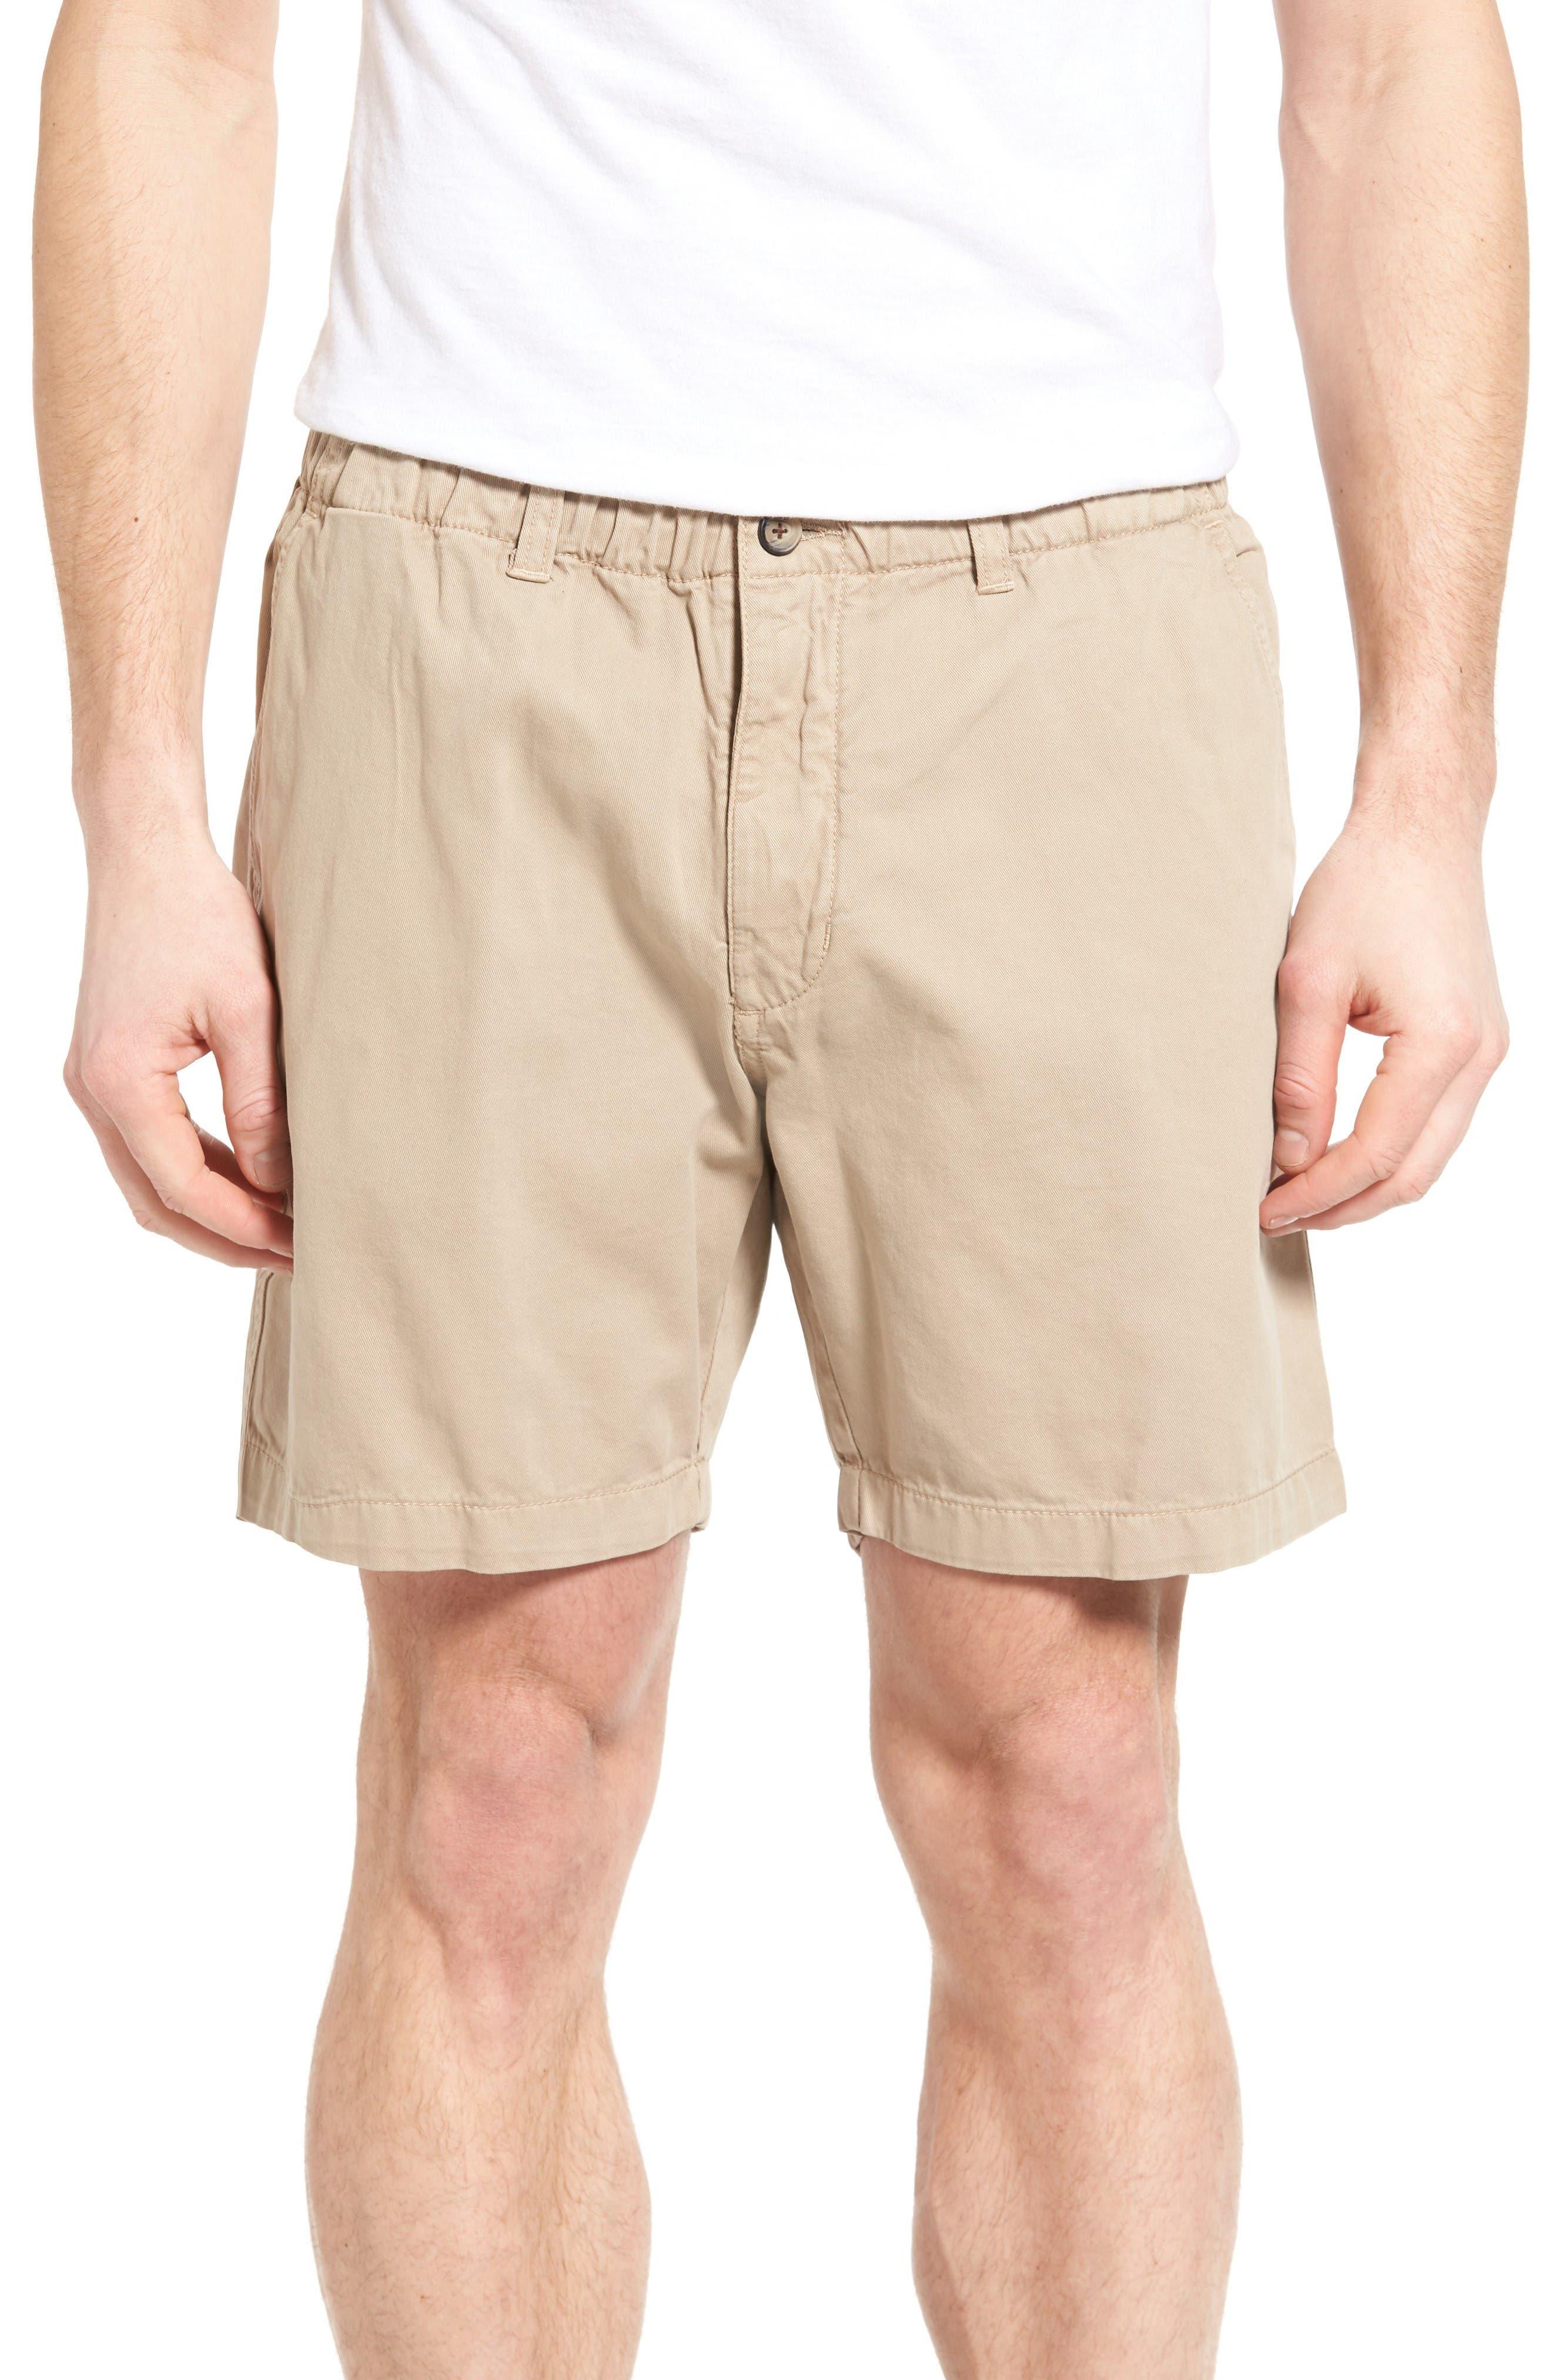 Alternate Image 1 Selected - Vintage 1946 Washed Shorts